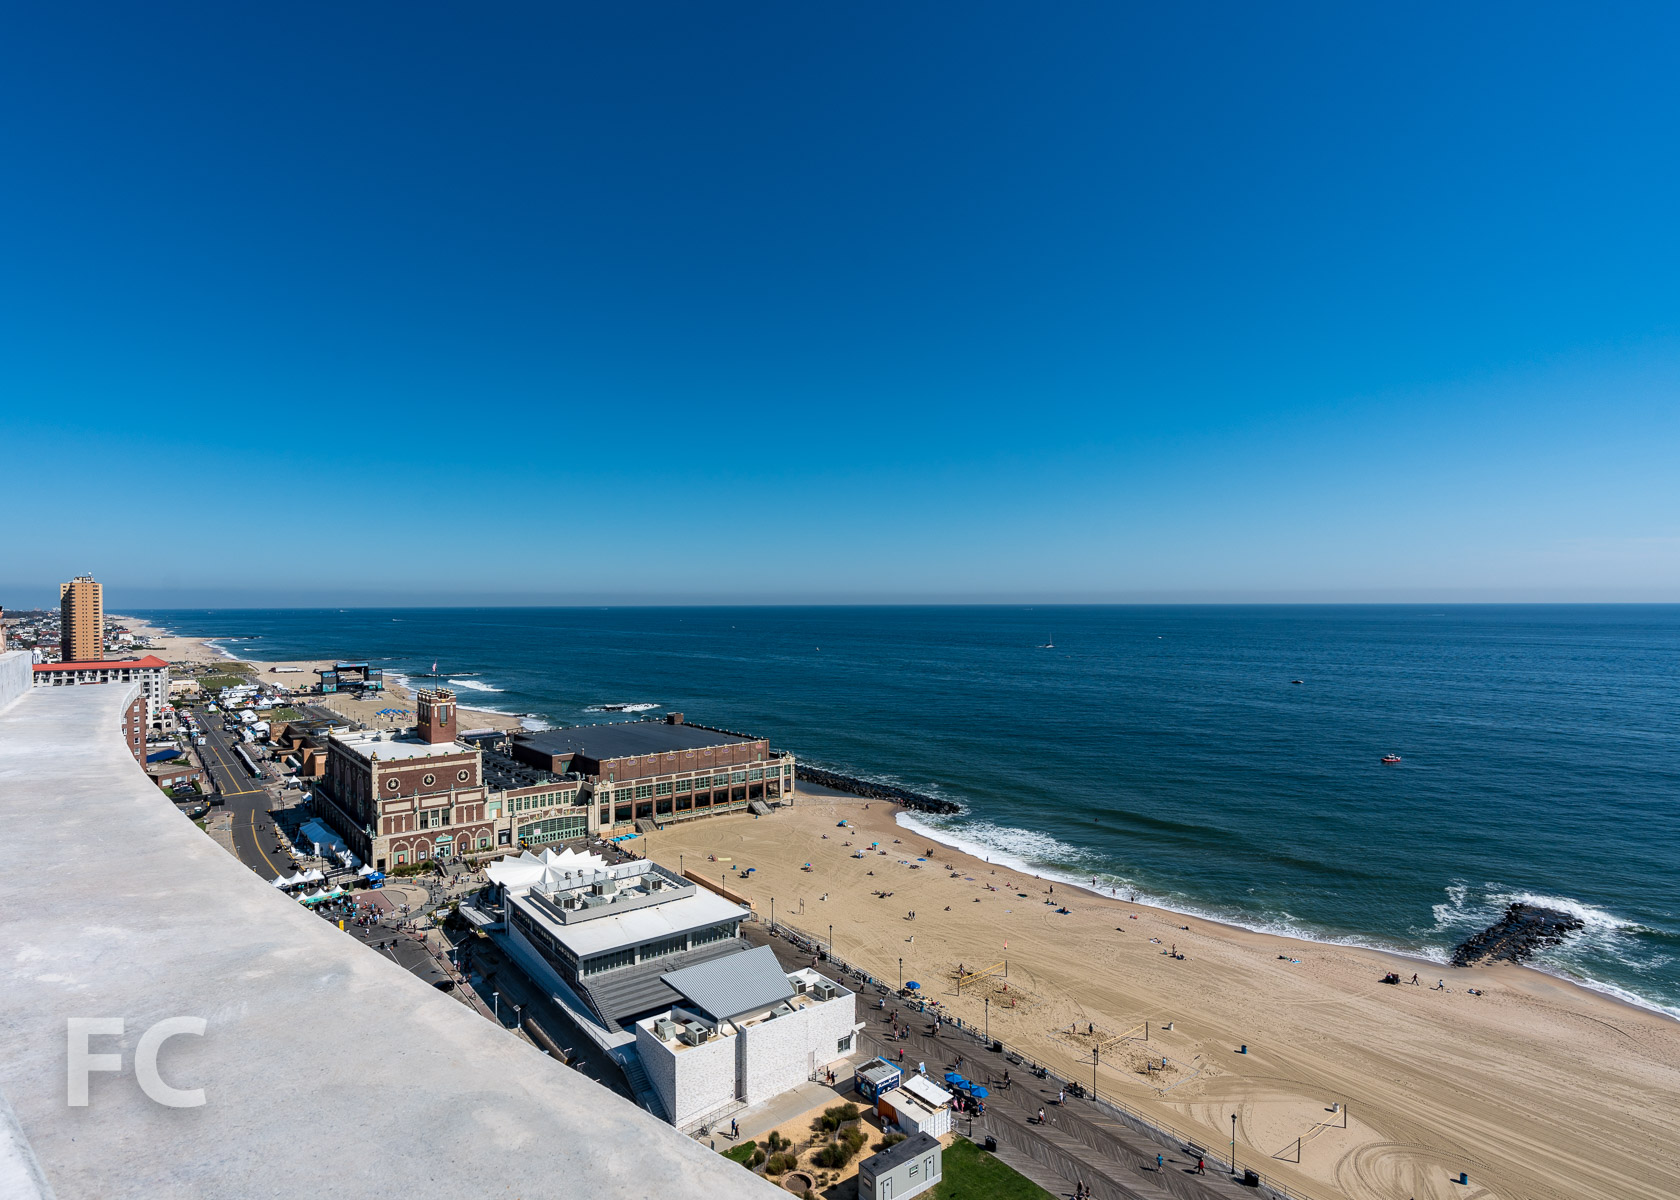 2018_09_30-Asbury Ocean Club-DSC07645.jpg